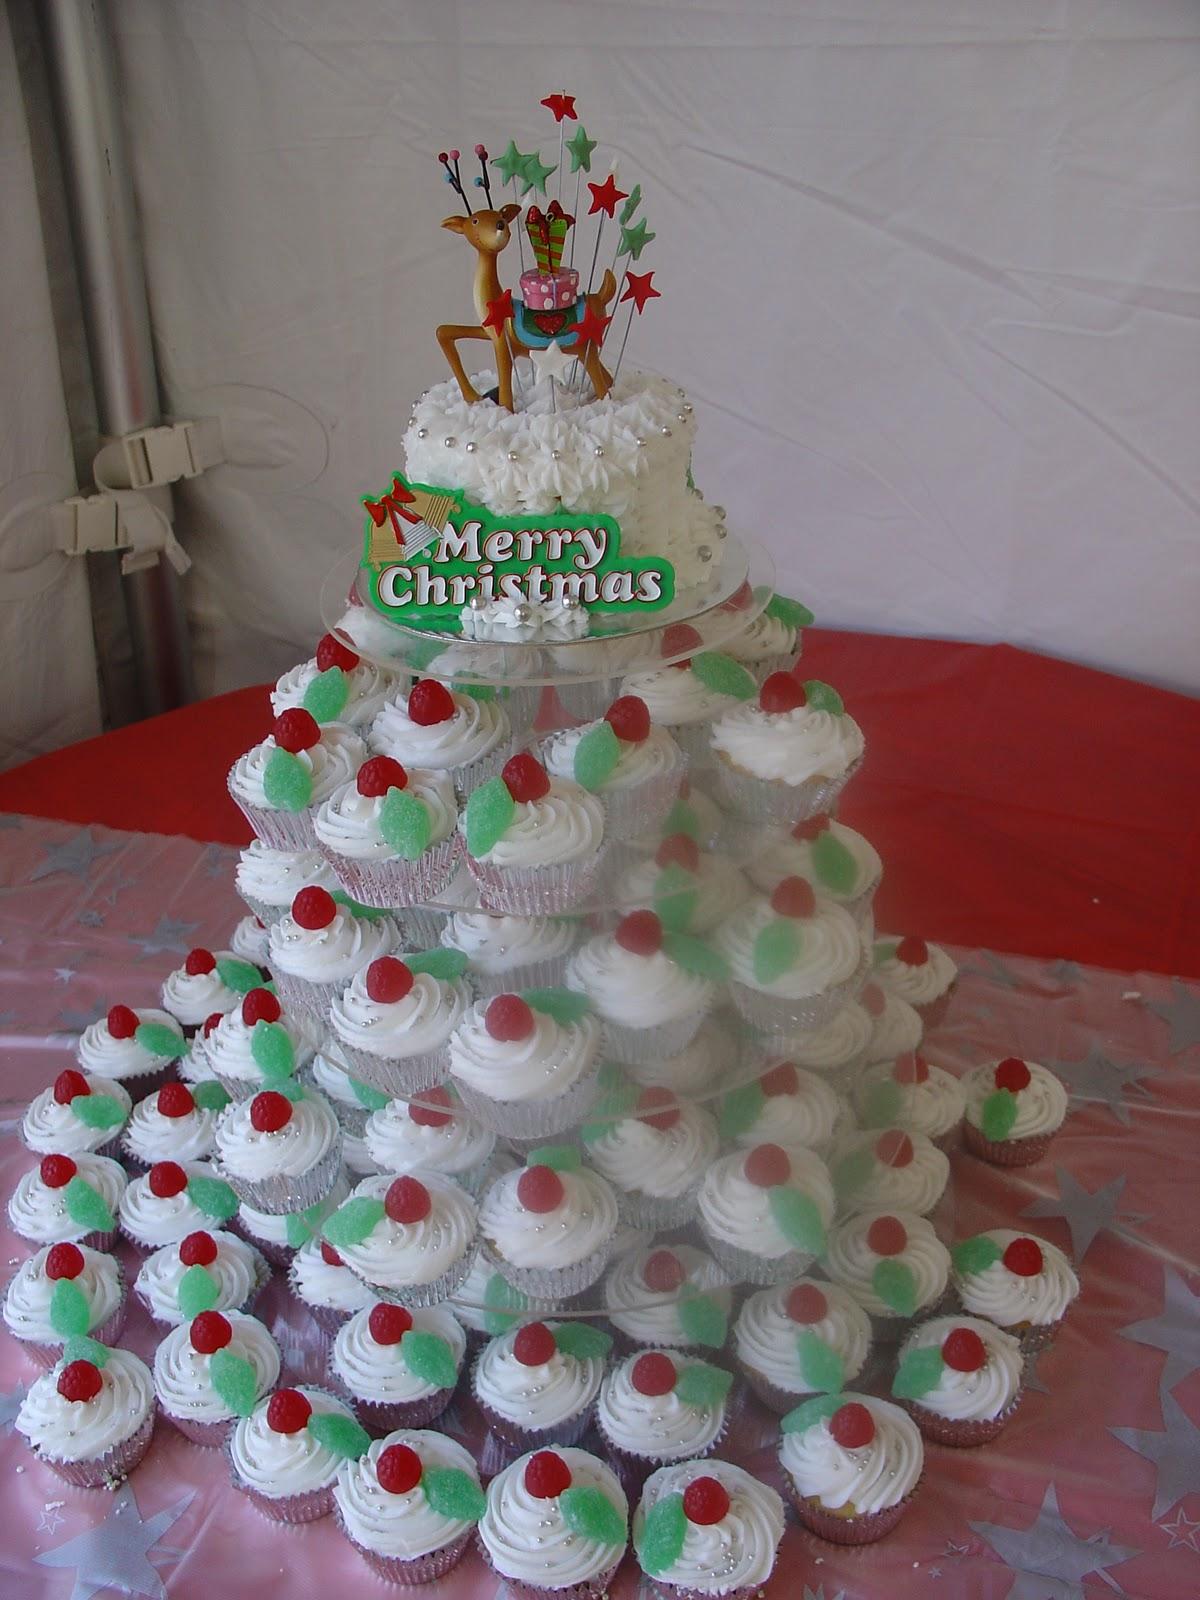 Festivals Pictures Christmas Cake 2012 Christmas Cake